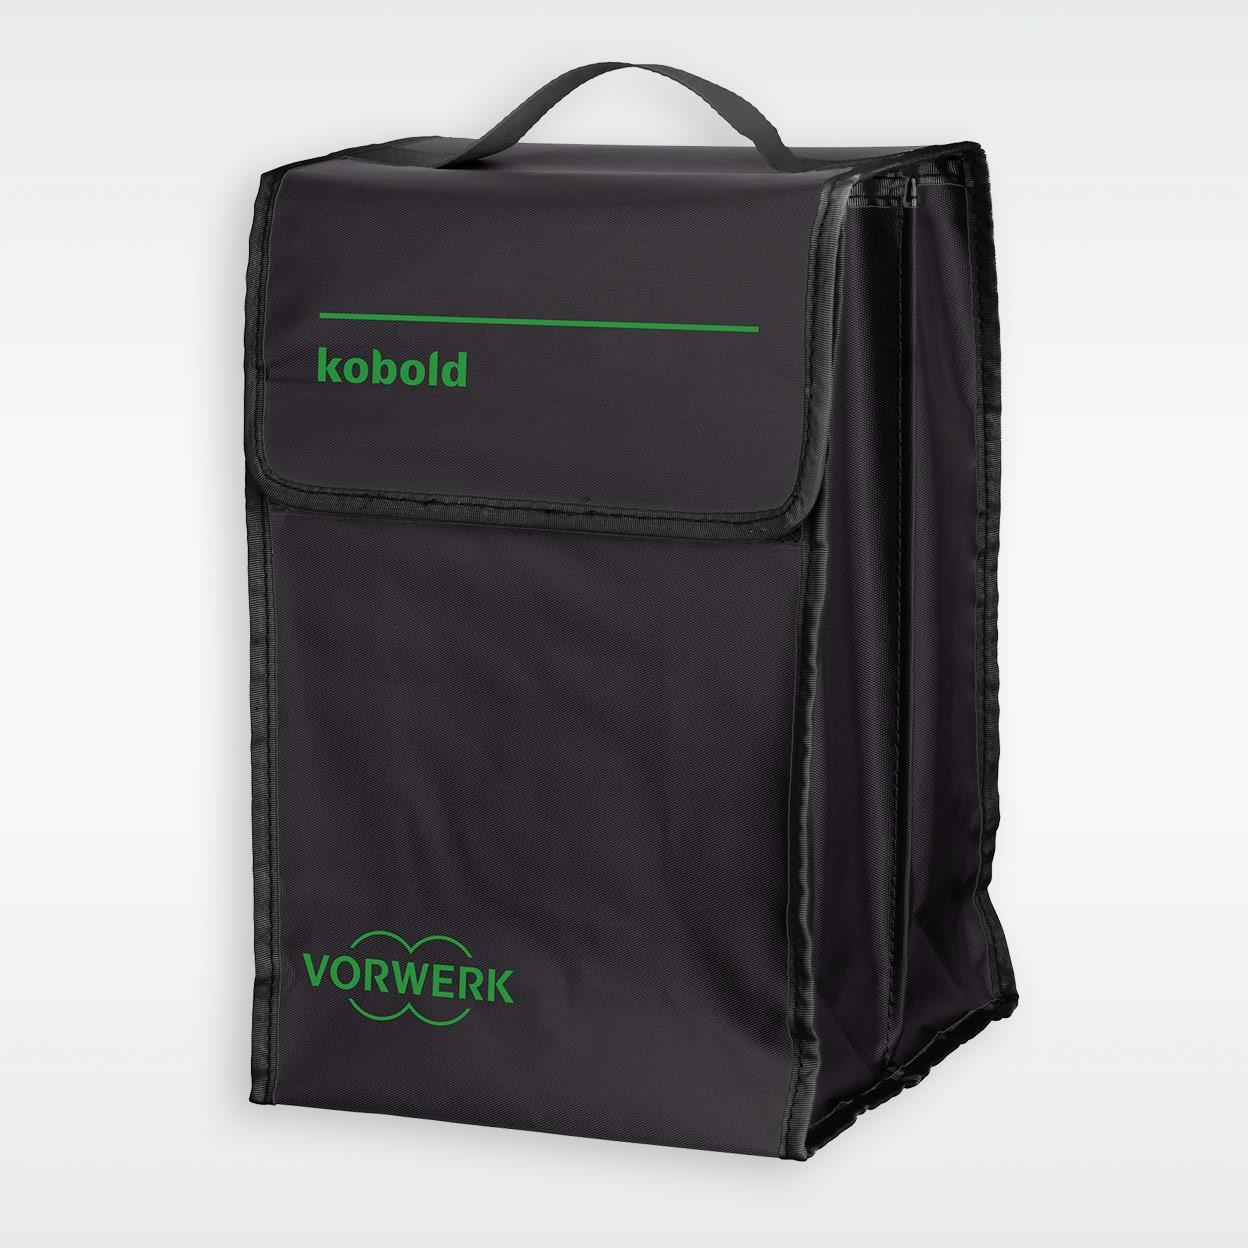 Sp Accessory Bag Vorwerk Vacuum Cleaner From Vk Direct